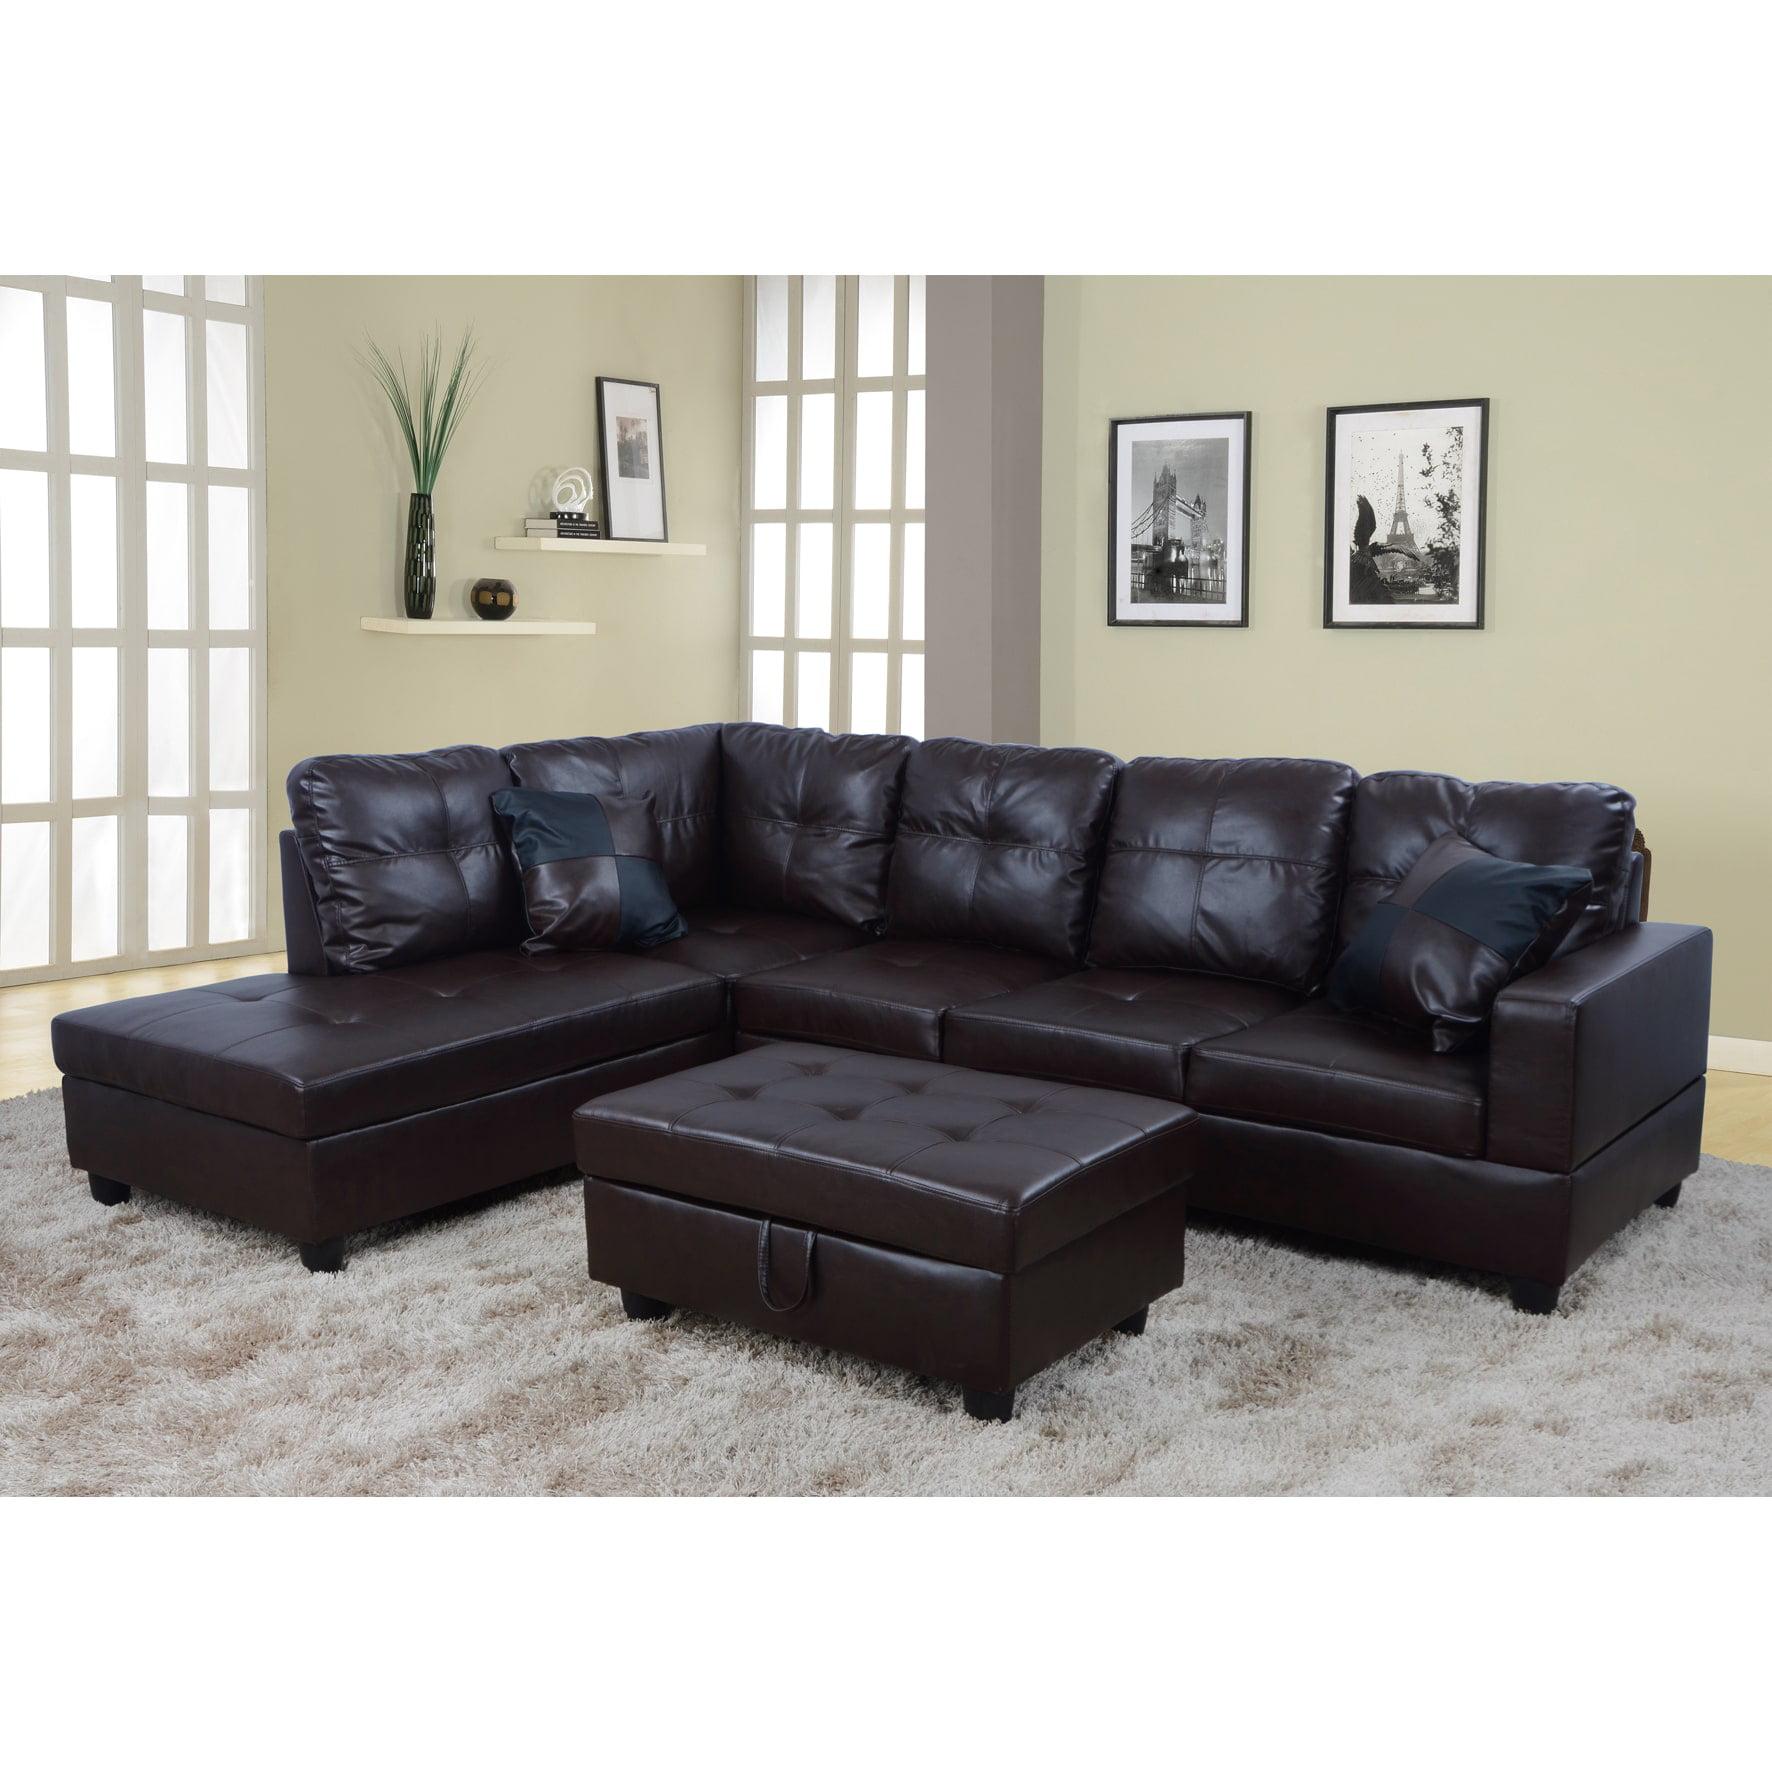 Lifestyle Furniture Lf093a Urbania Left Hand Facing Sectional Sofa 44 Dark Chocolate 35 X 103 5 X 74 5 In Walmart Com Walmart Com